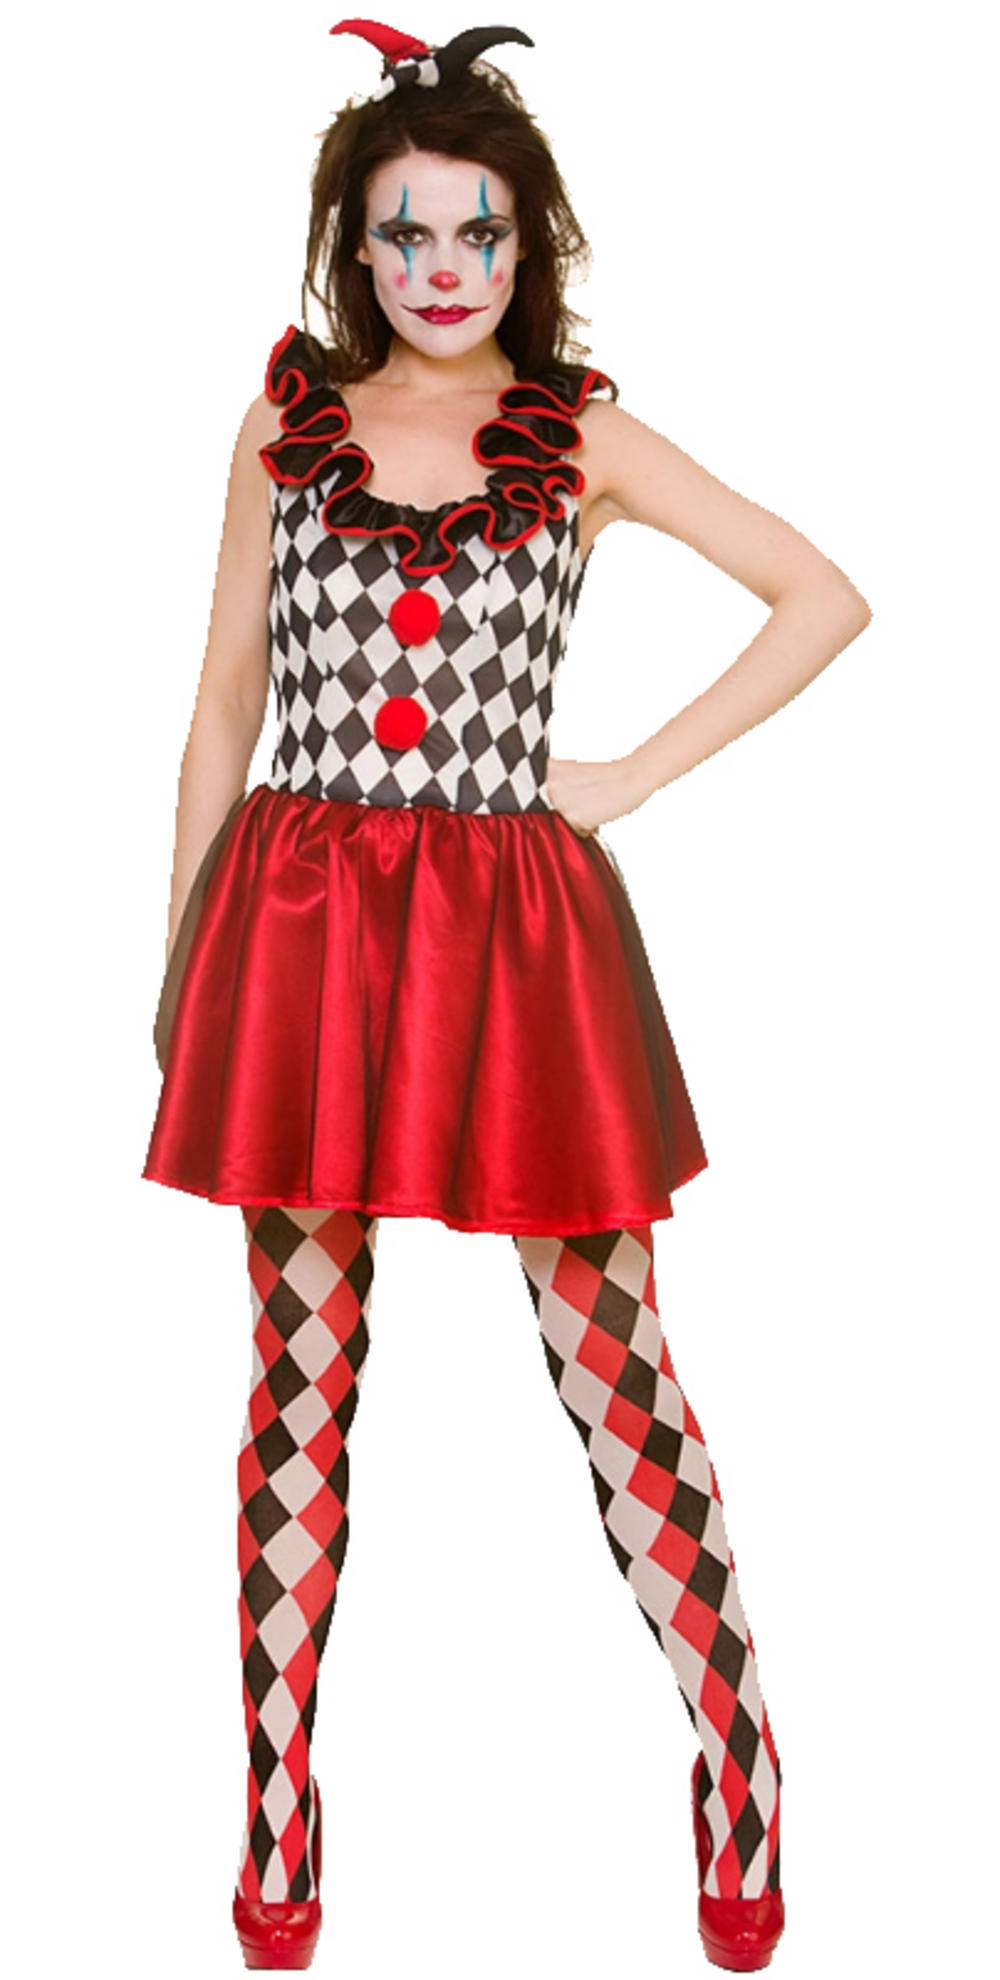 Harlequin Jester Ladies Costume